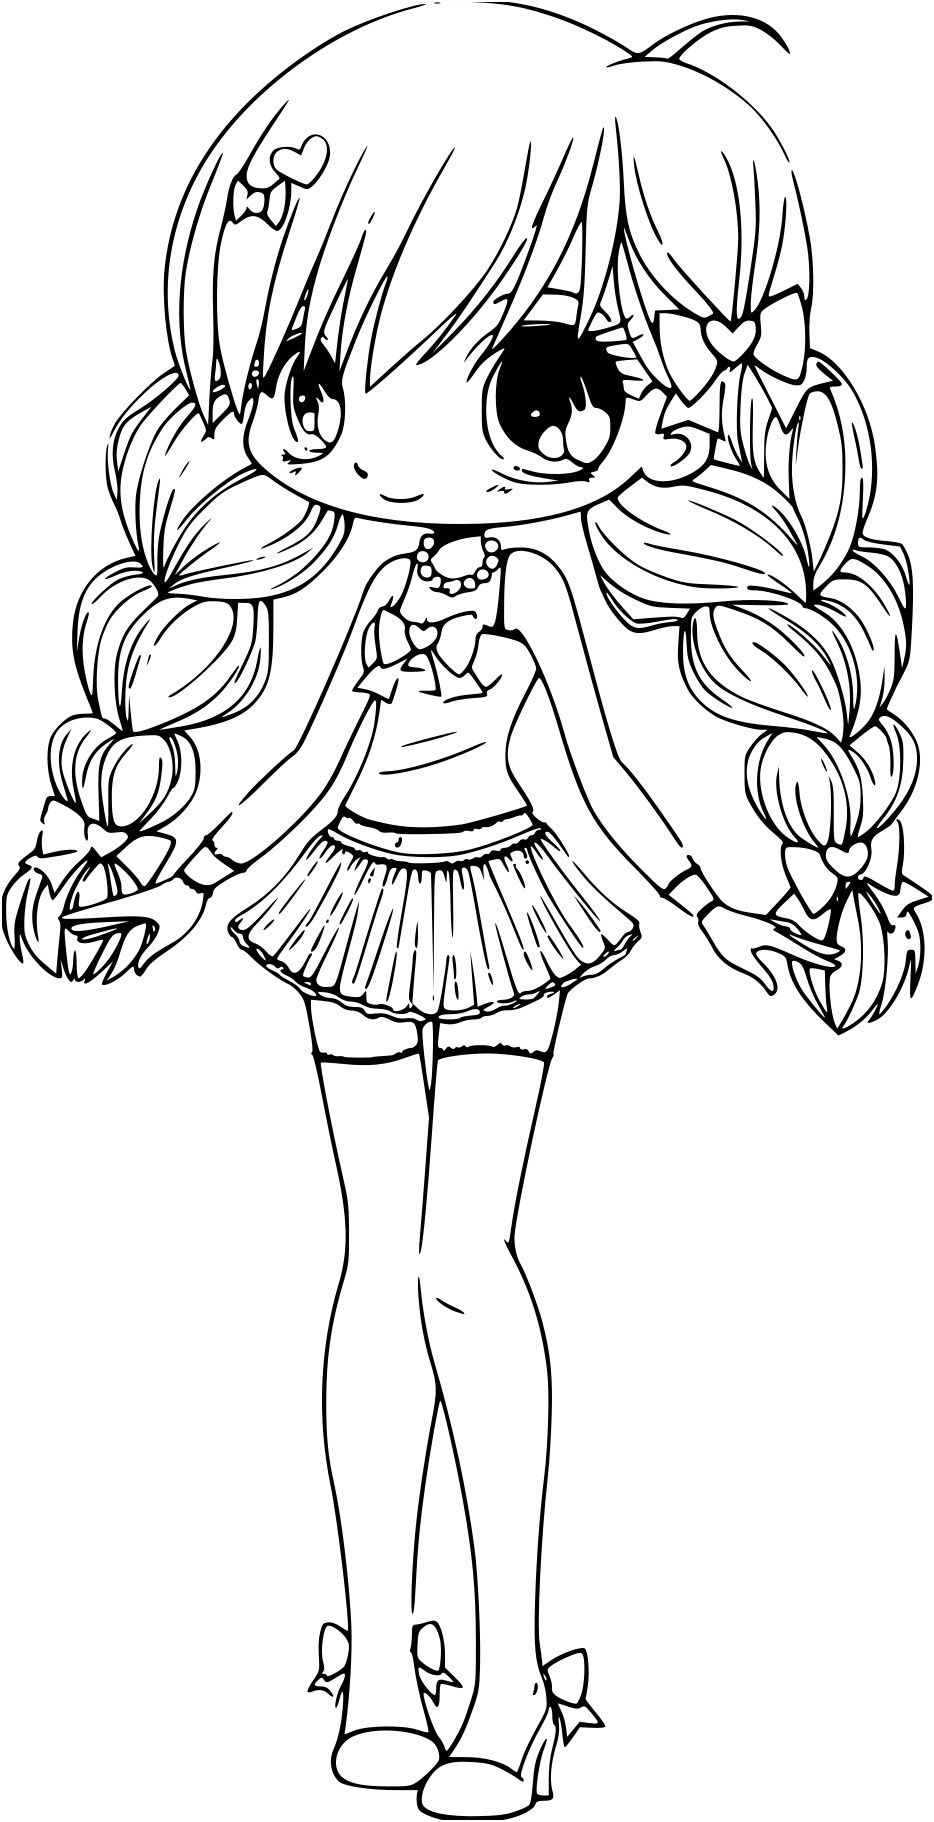 Coloriage Chibi princesse à imprimerColoriage à imprimer